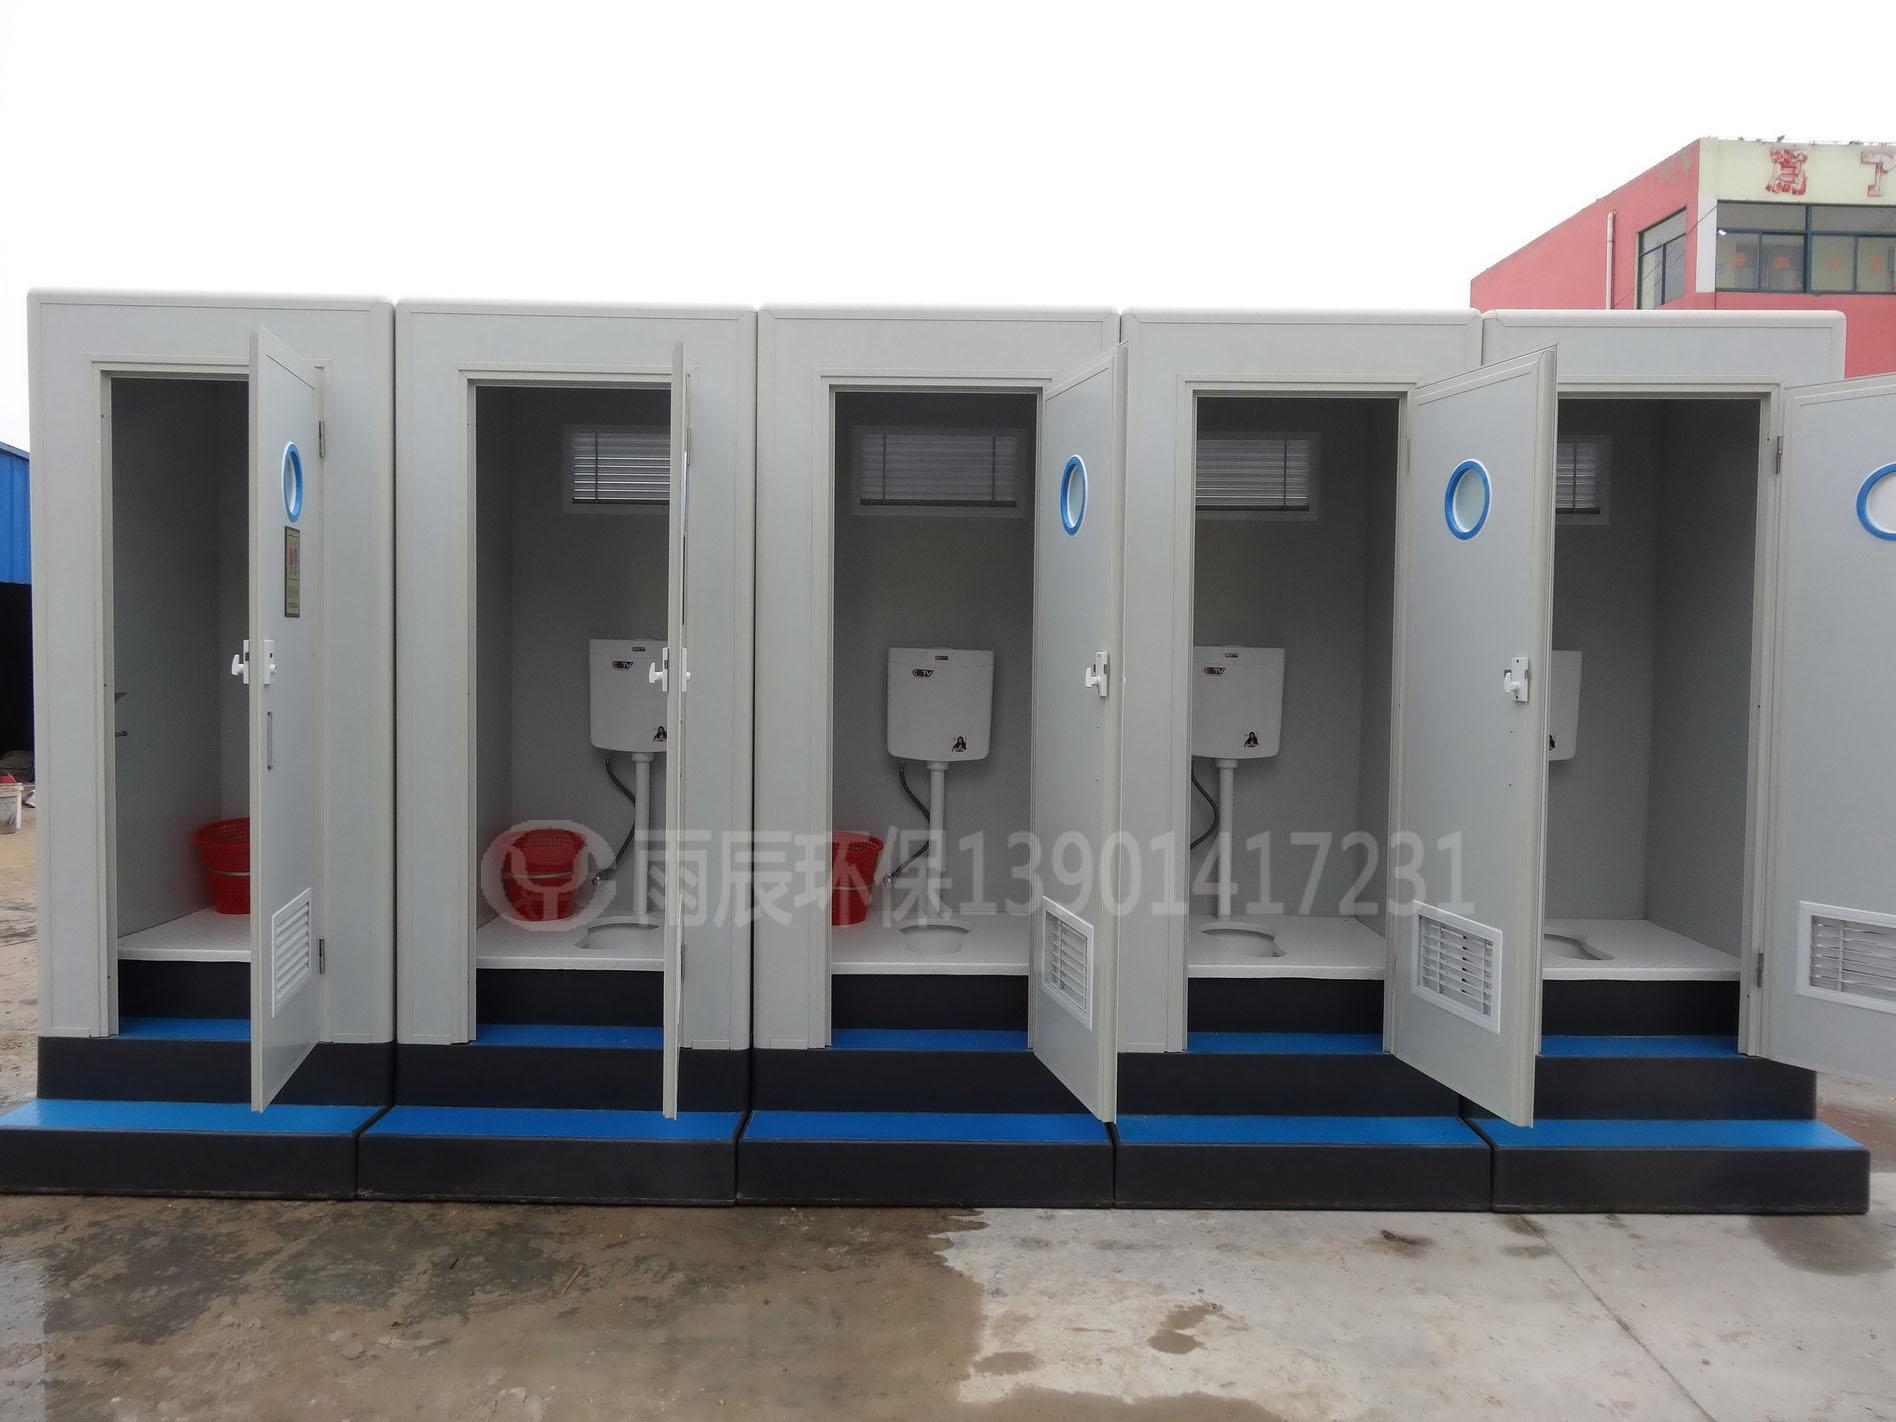 WCM-JH10103 净化板1米水冲公厕